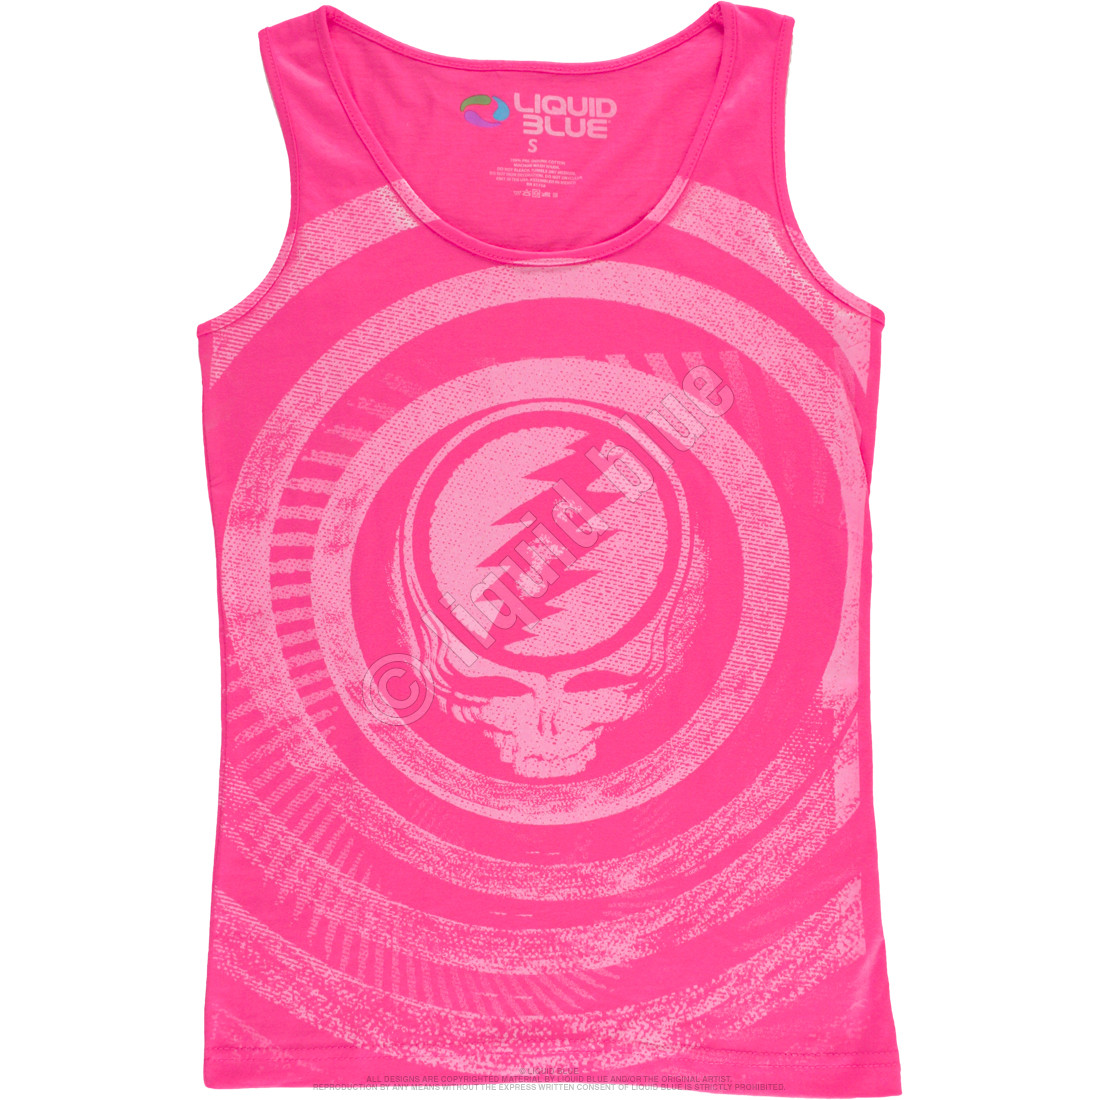 Ripple Tie-Dye Juniors Tank Top T-Shirt